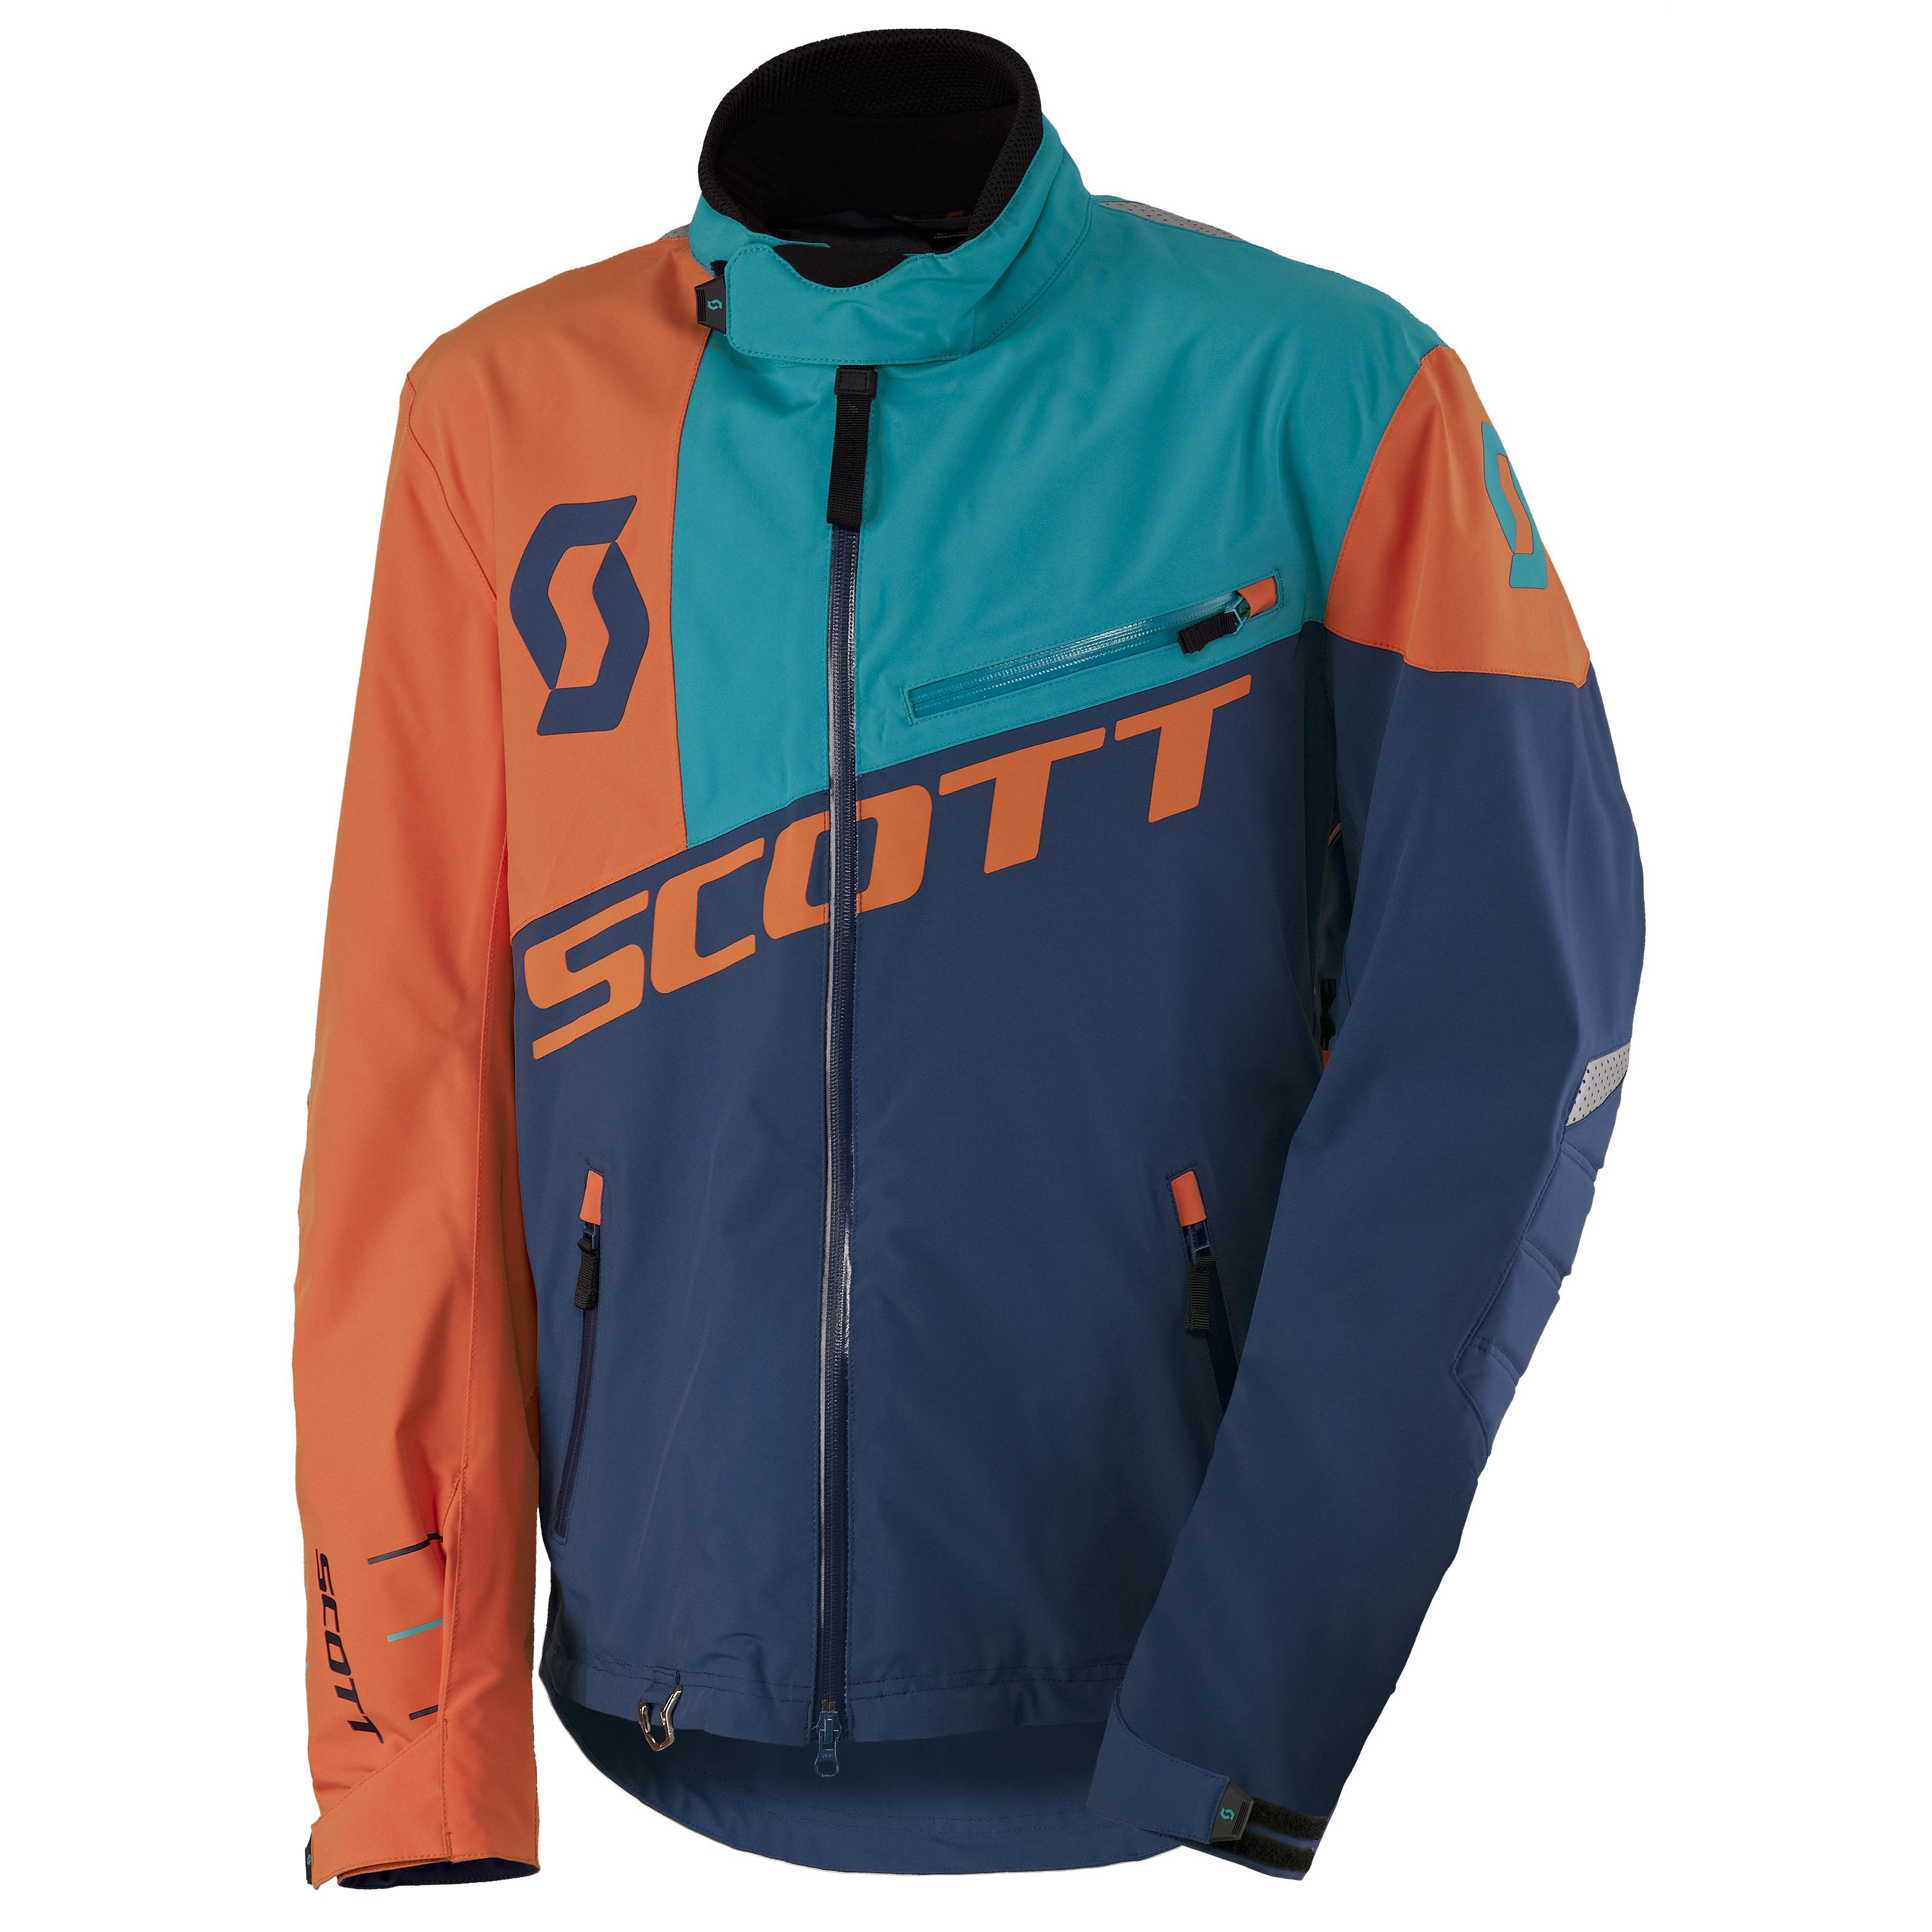 Scott Takki Comp Pro Shell sini. oranssi S 311 404410769c